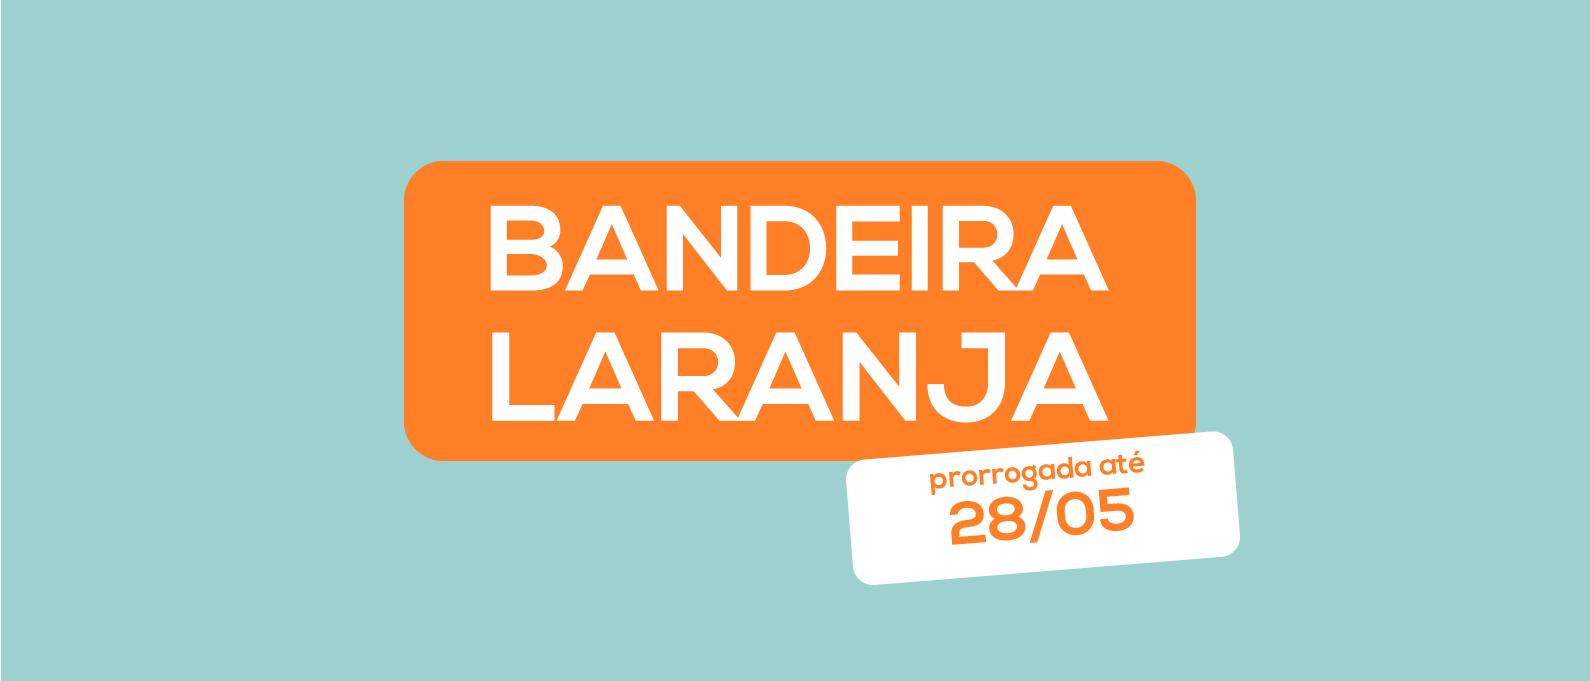 CURITIBA PRORROGA DECRETO DA BANDEIRA LARANJA ATÉ SEXTA-FEIRA (28/05) [+]